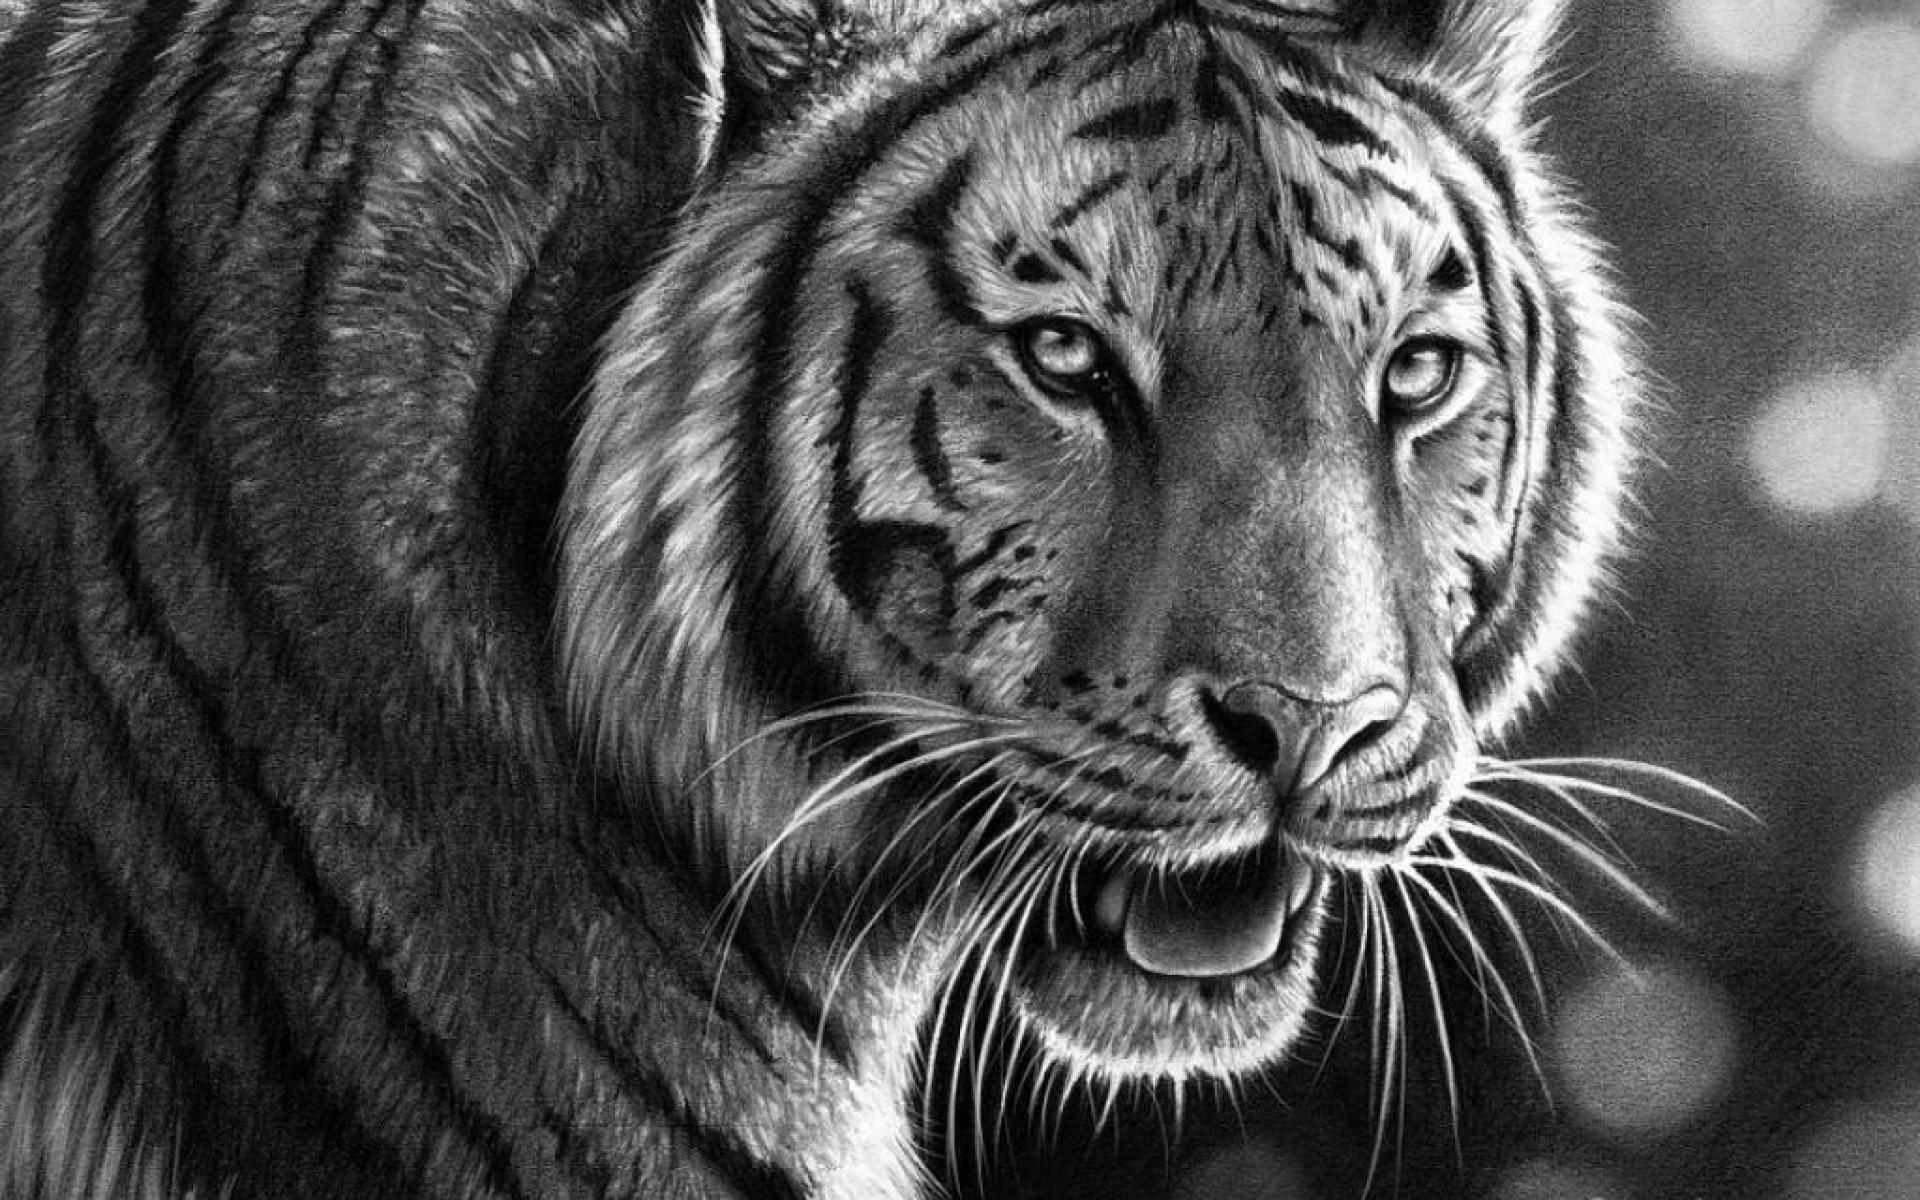 Drawn wallpaper tiger Drawing Tiger Tiger  wallpaper